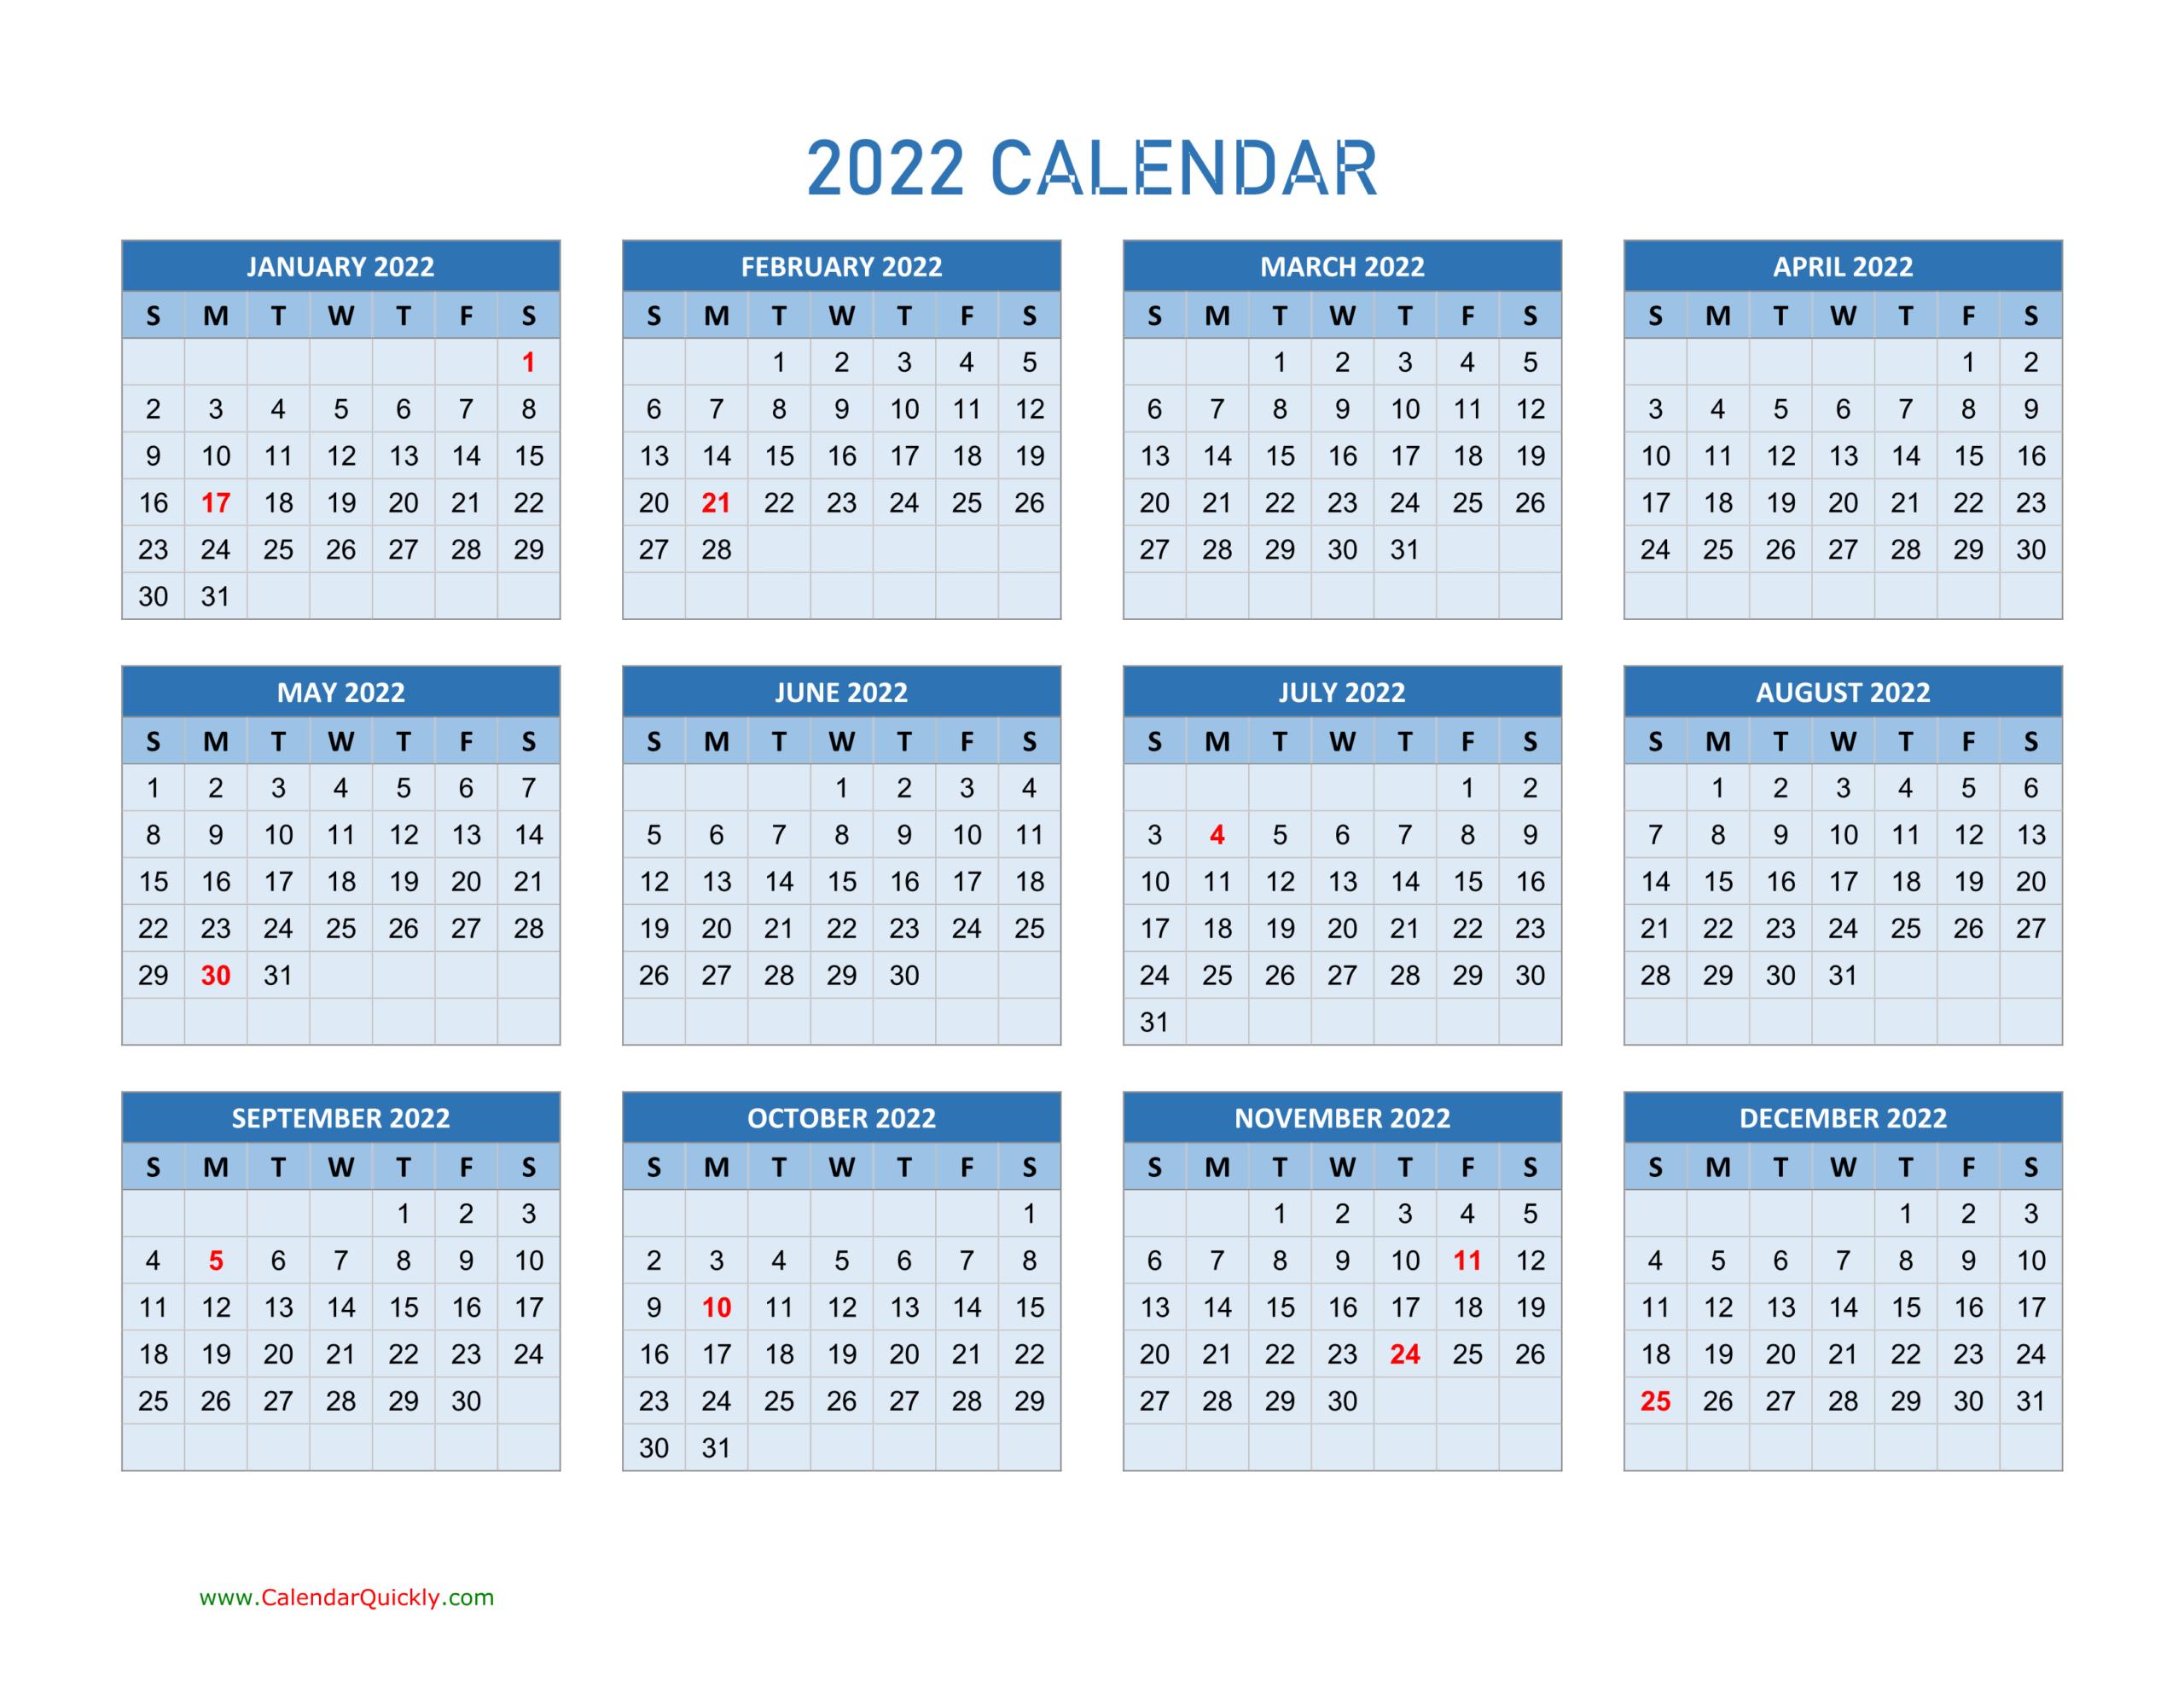 Year 2022 Calendars | Calendar Quickly inside Full Page January 2022 Calendar